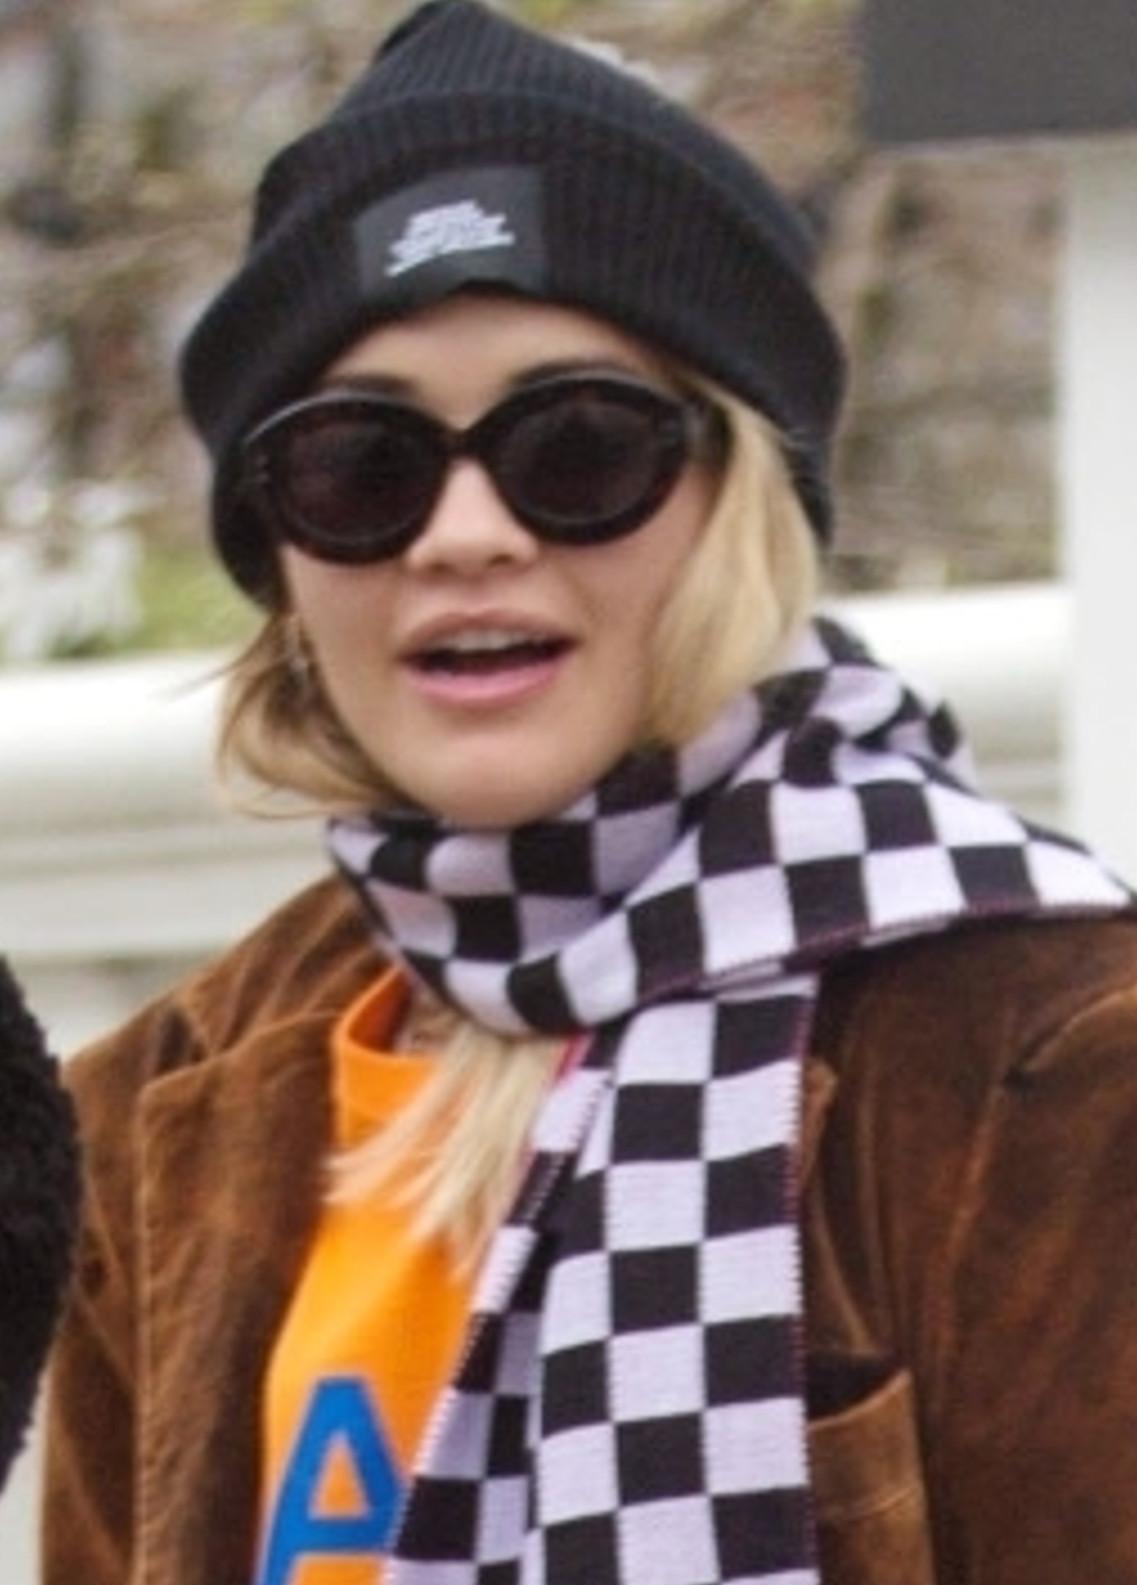 Rita Ora na ulicach Londynu podczas epidemii koronawirusa.